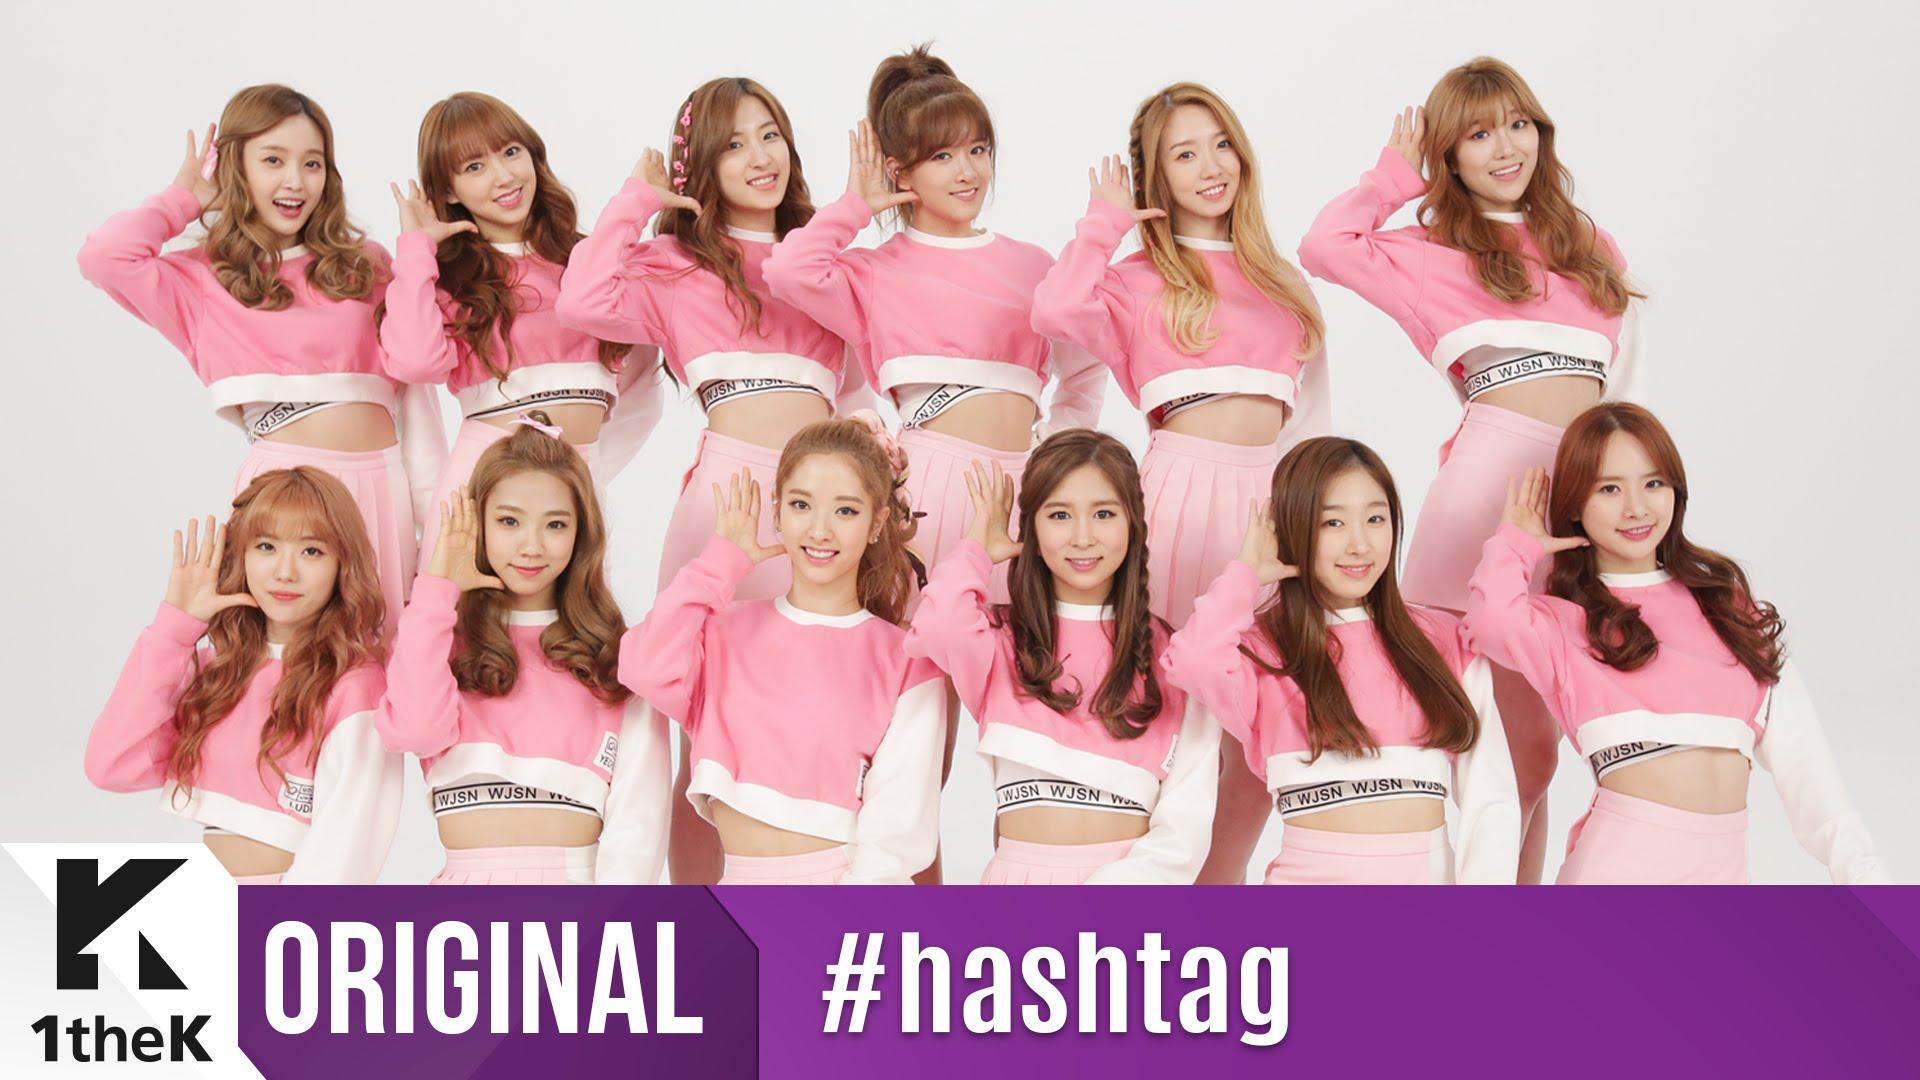 Cosmic Girls Hd Wallpaper 66875 Asiachan Kpop Image Board